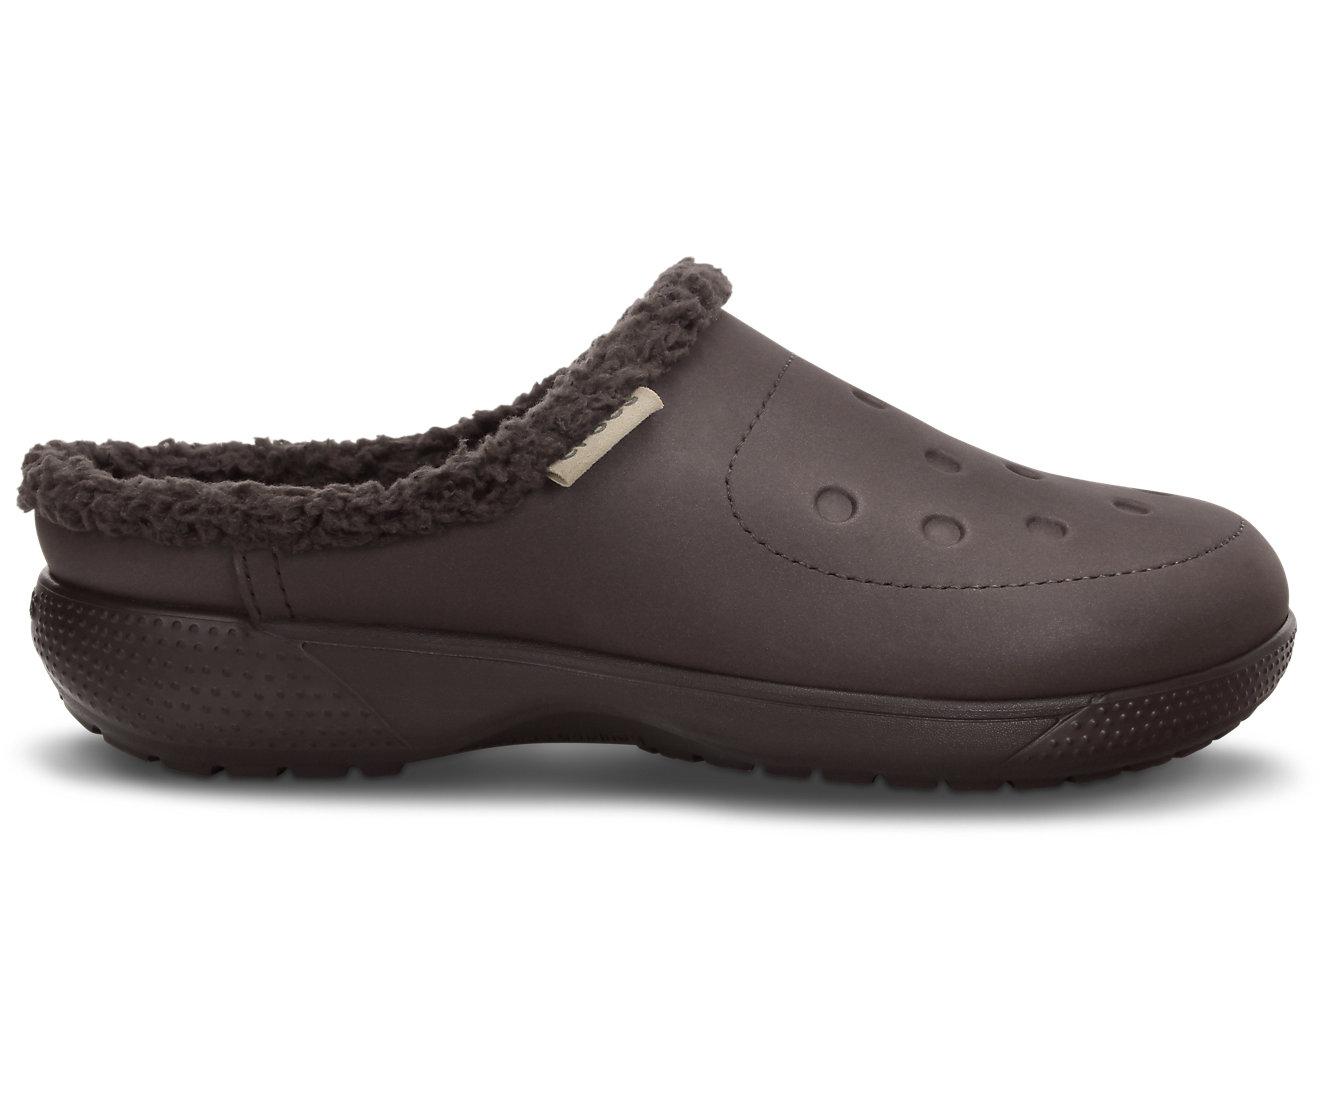 CrocsColorLite™ Lined Clog